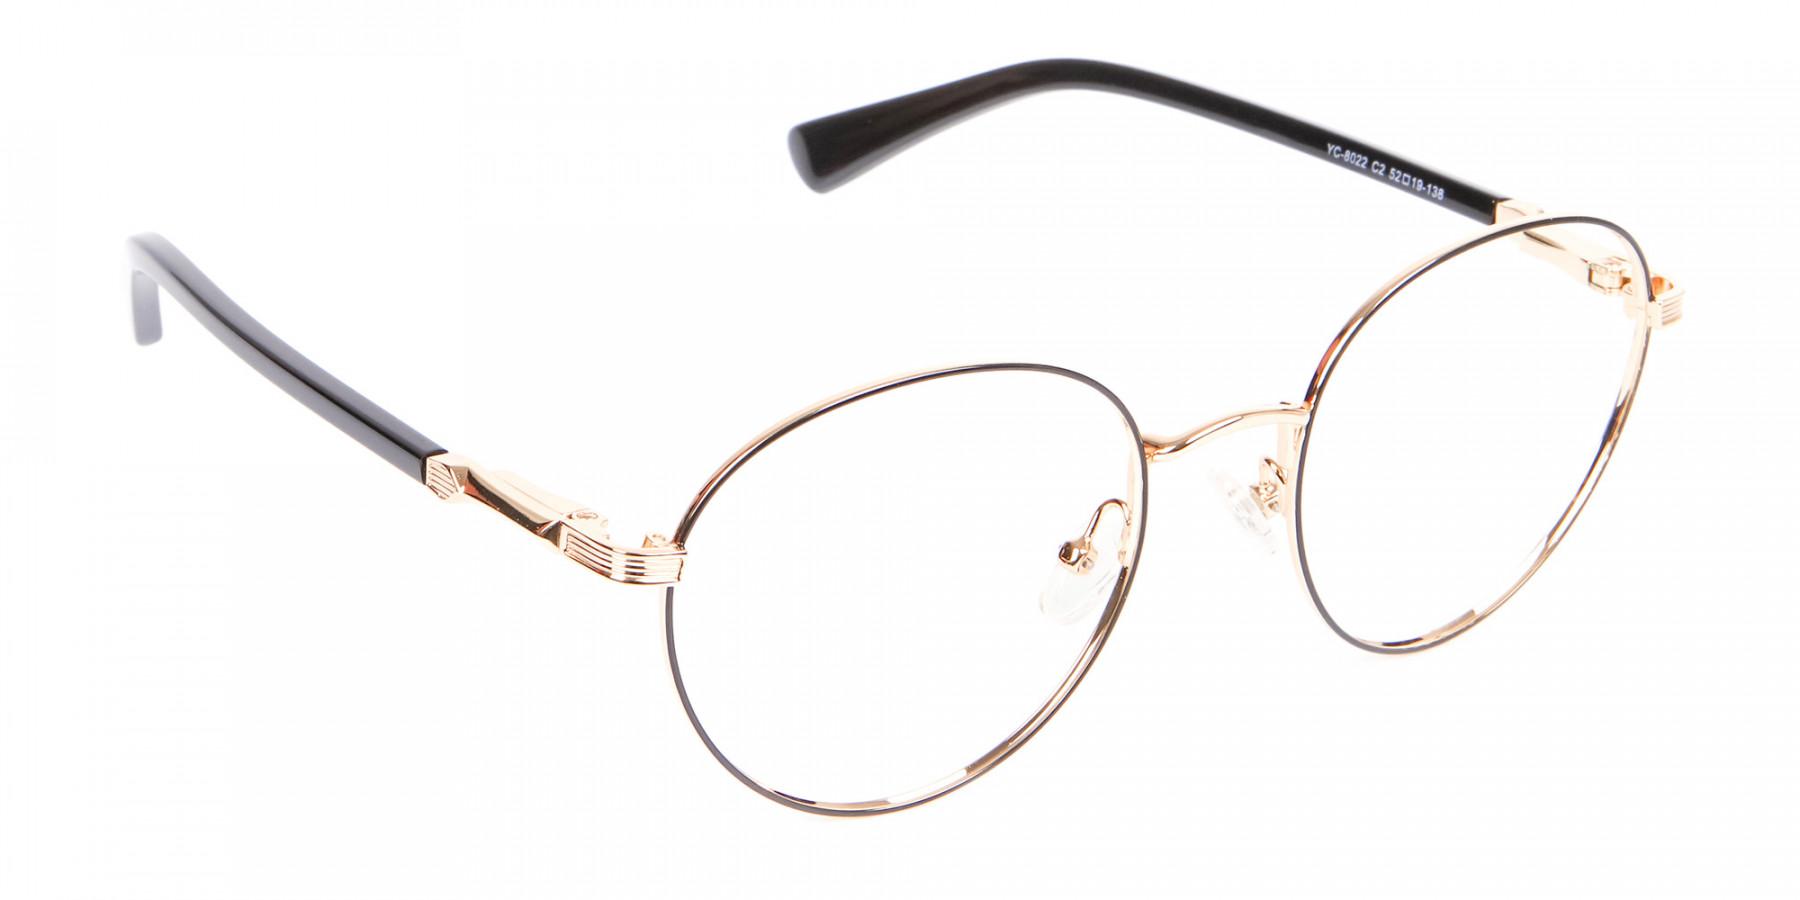 Round Gold Metal Eyeglasses Frame - 1